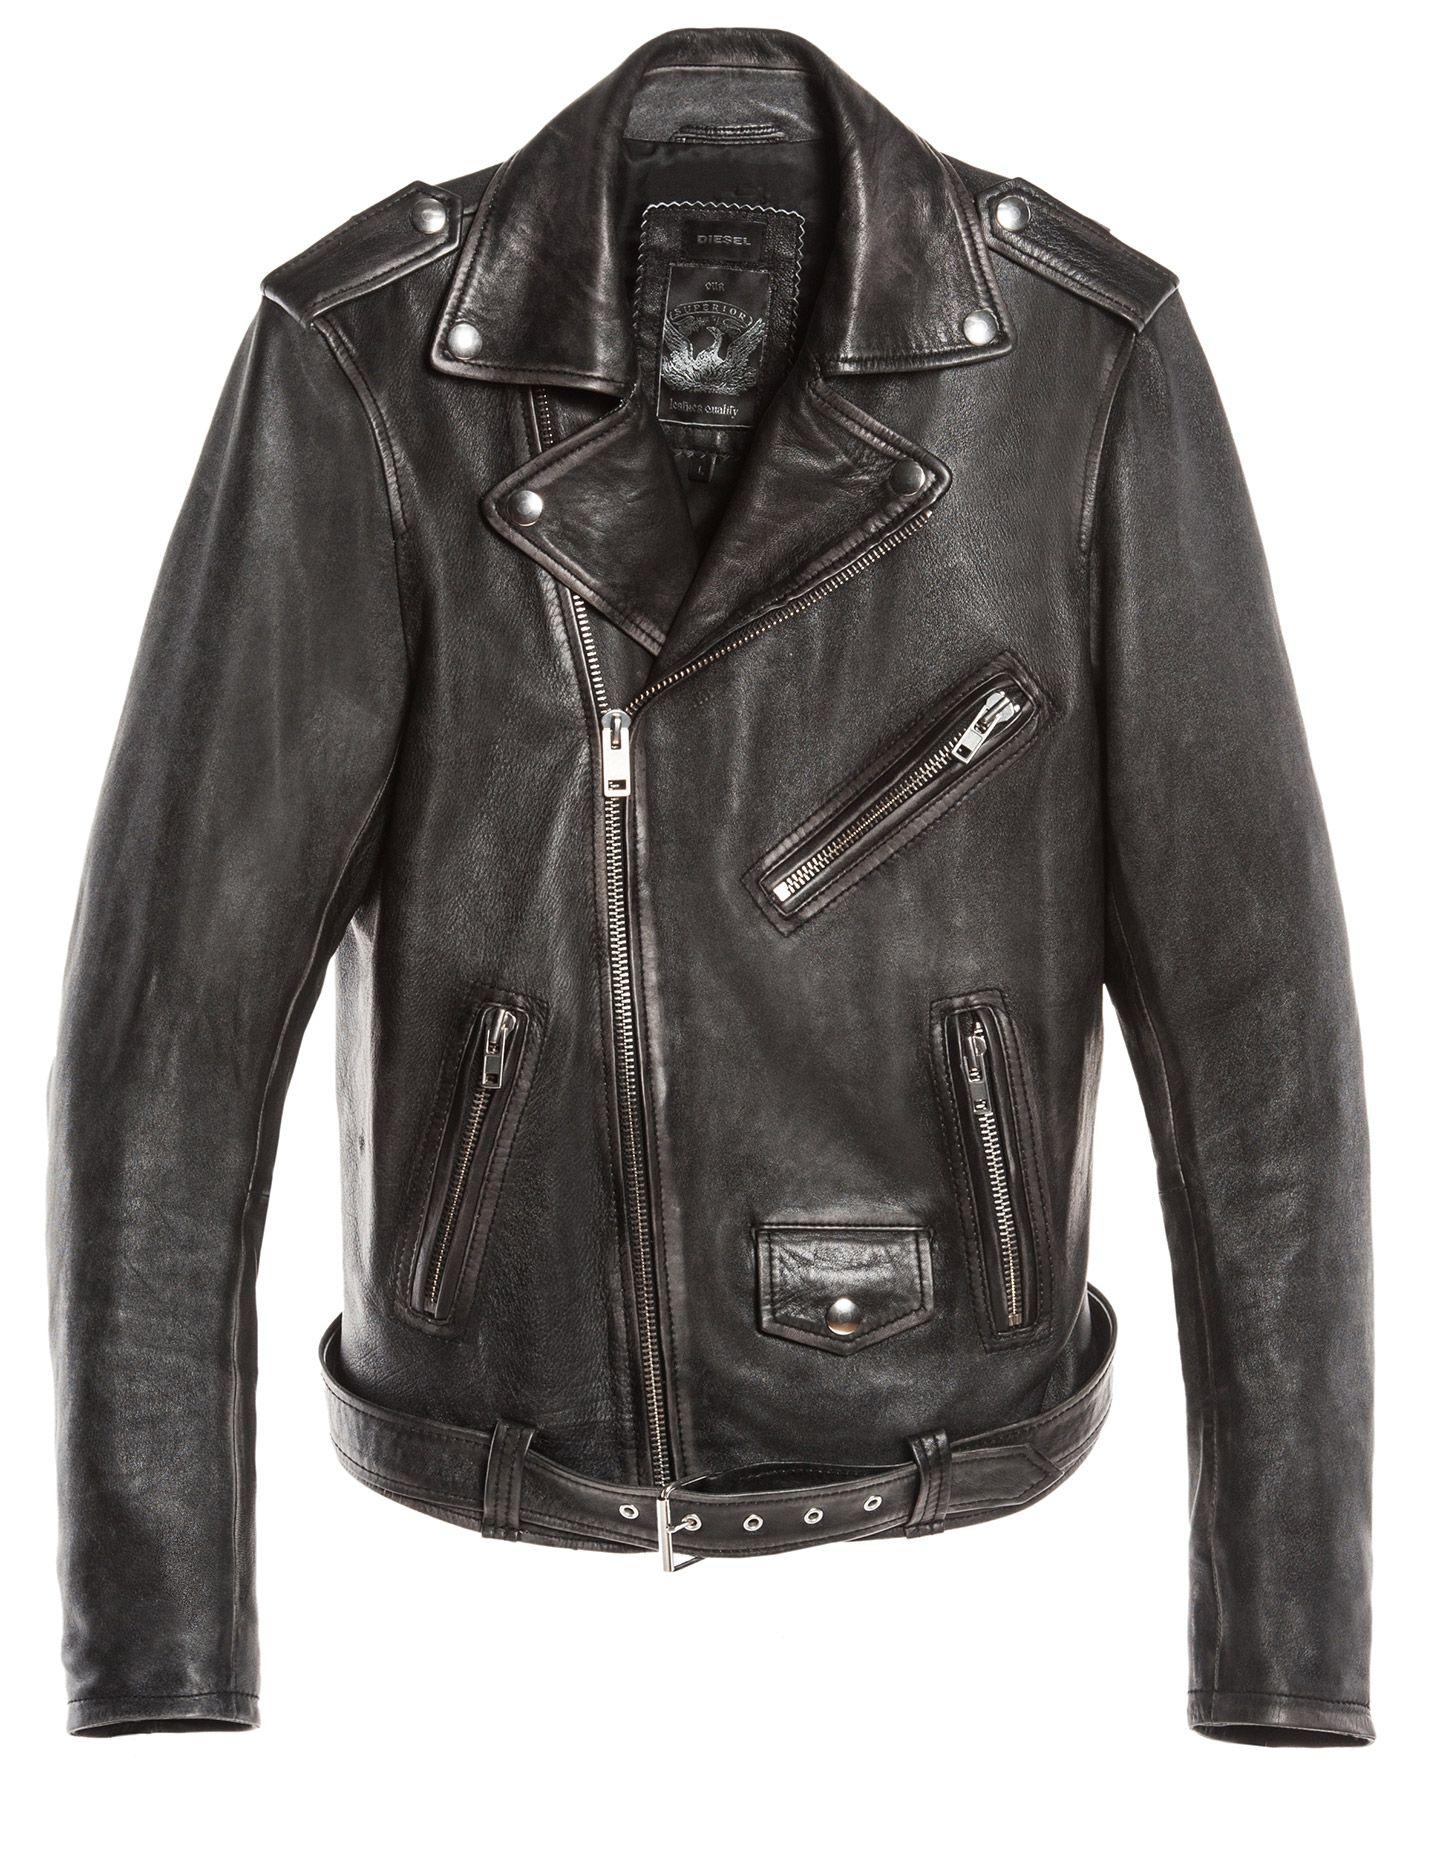 Diesel Men S Apparel Fw14 Preview L Seddik Mens Leather Clothing Leather Jacket Style Leather Jacket Men [ 1868 x 1440 Pixel ]